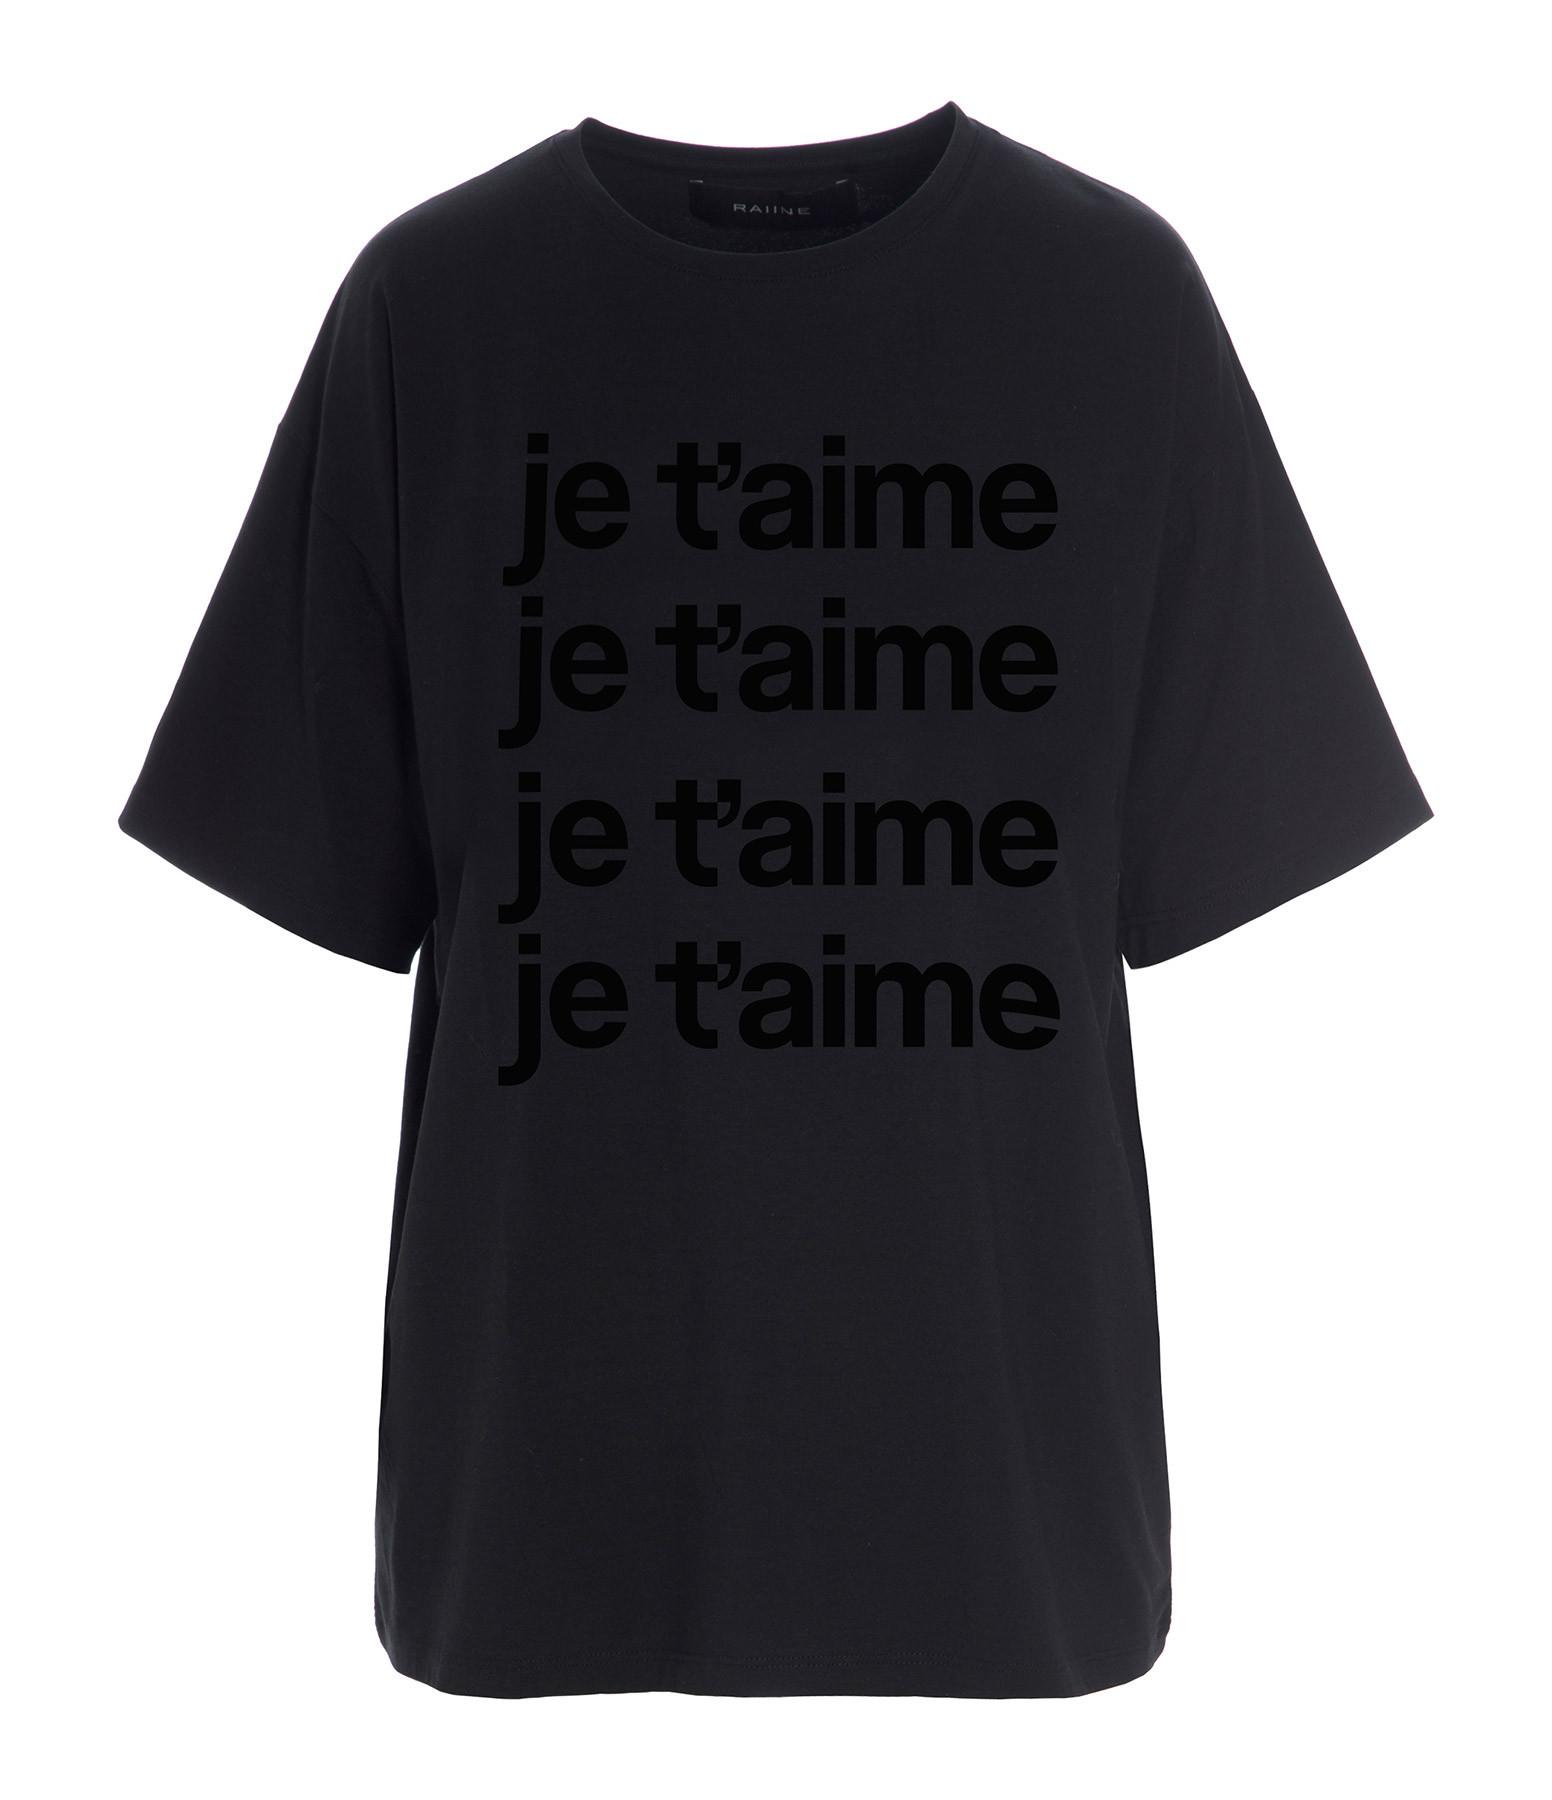 RAIINE - Tee-shirt Castor Coton Noir